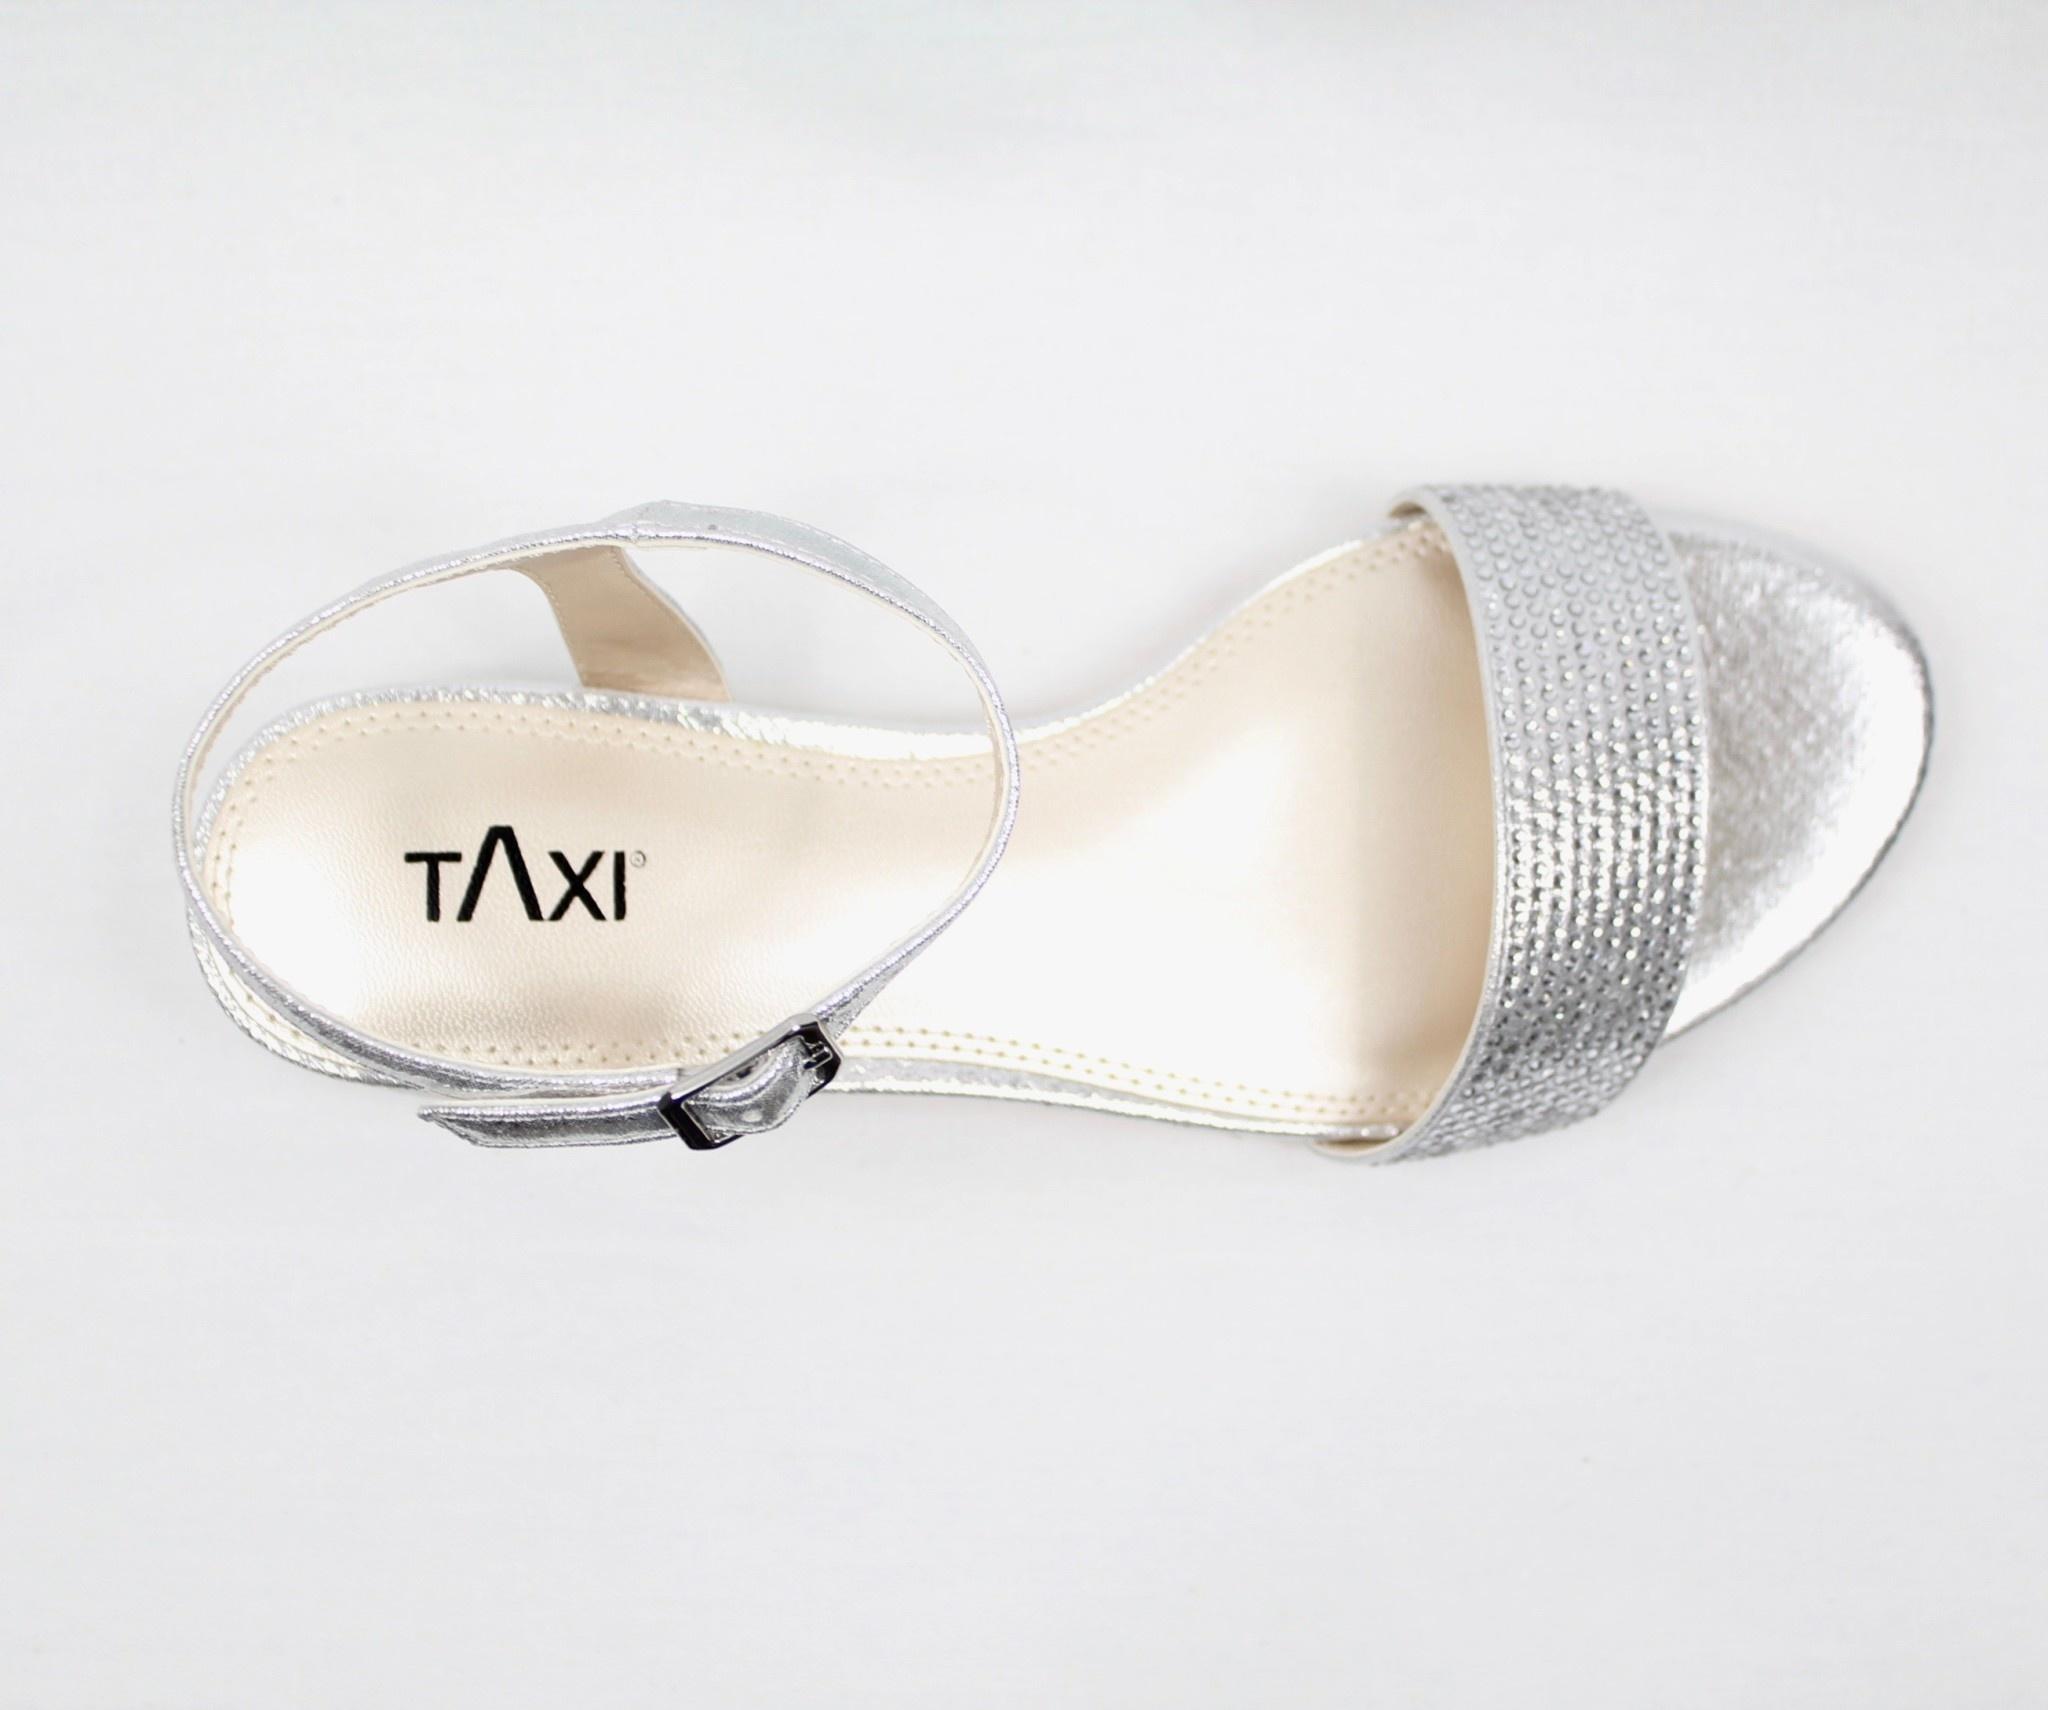 "TAXI TAXI ""ANGELA"" Ankle Strap Sandal  Reg. $75  Sale $55"